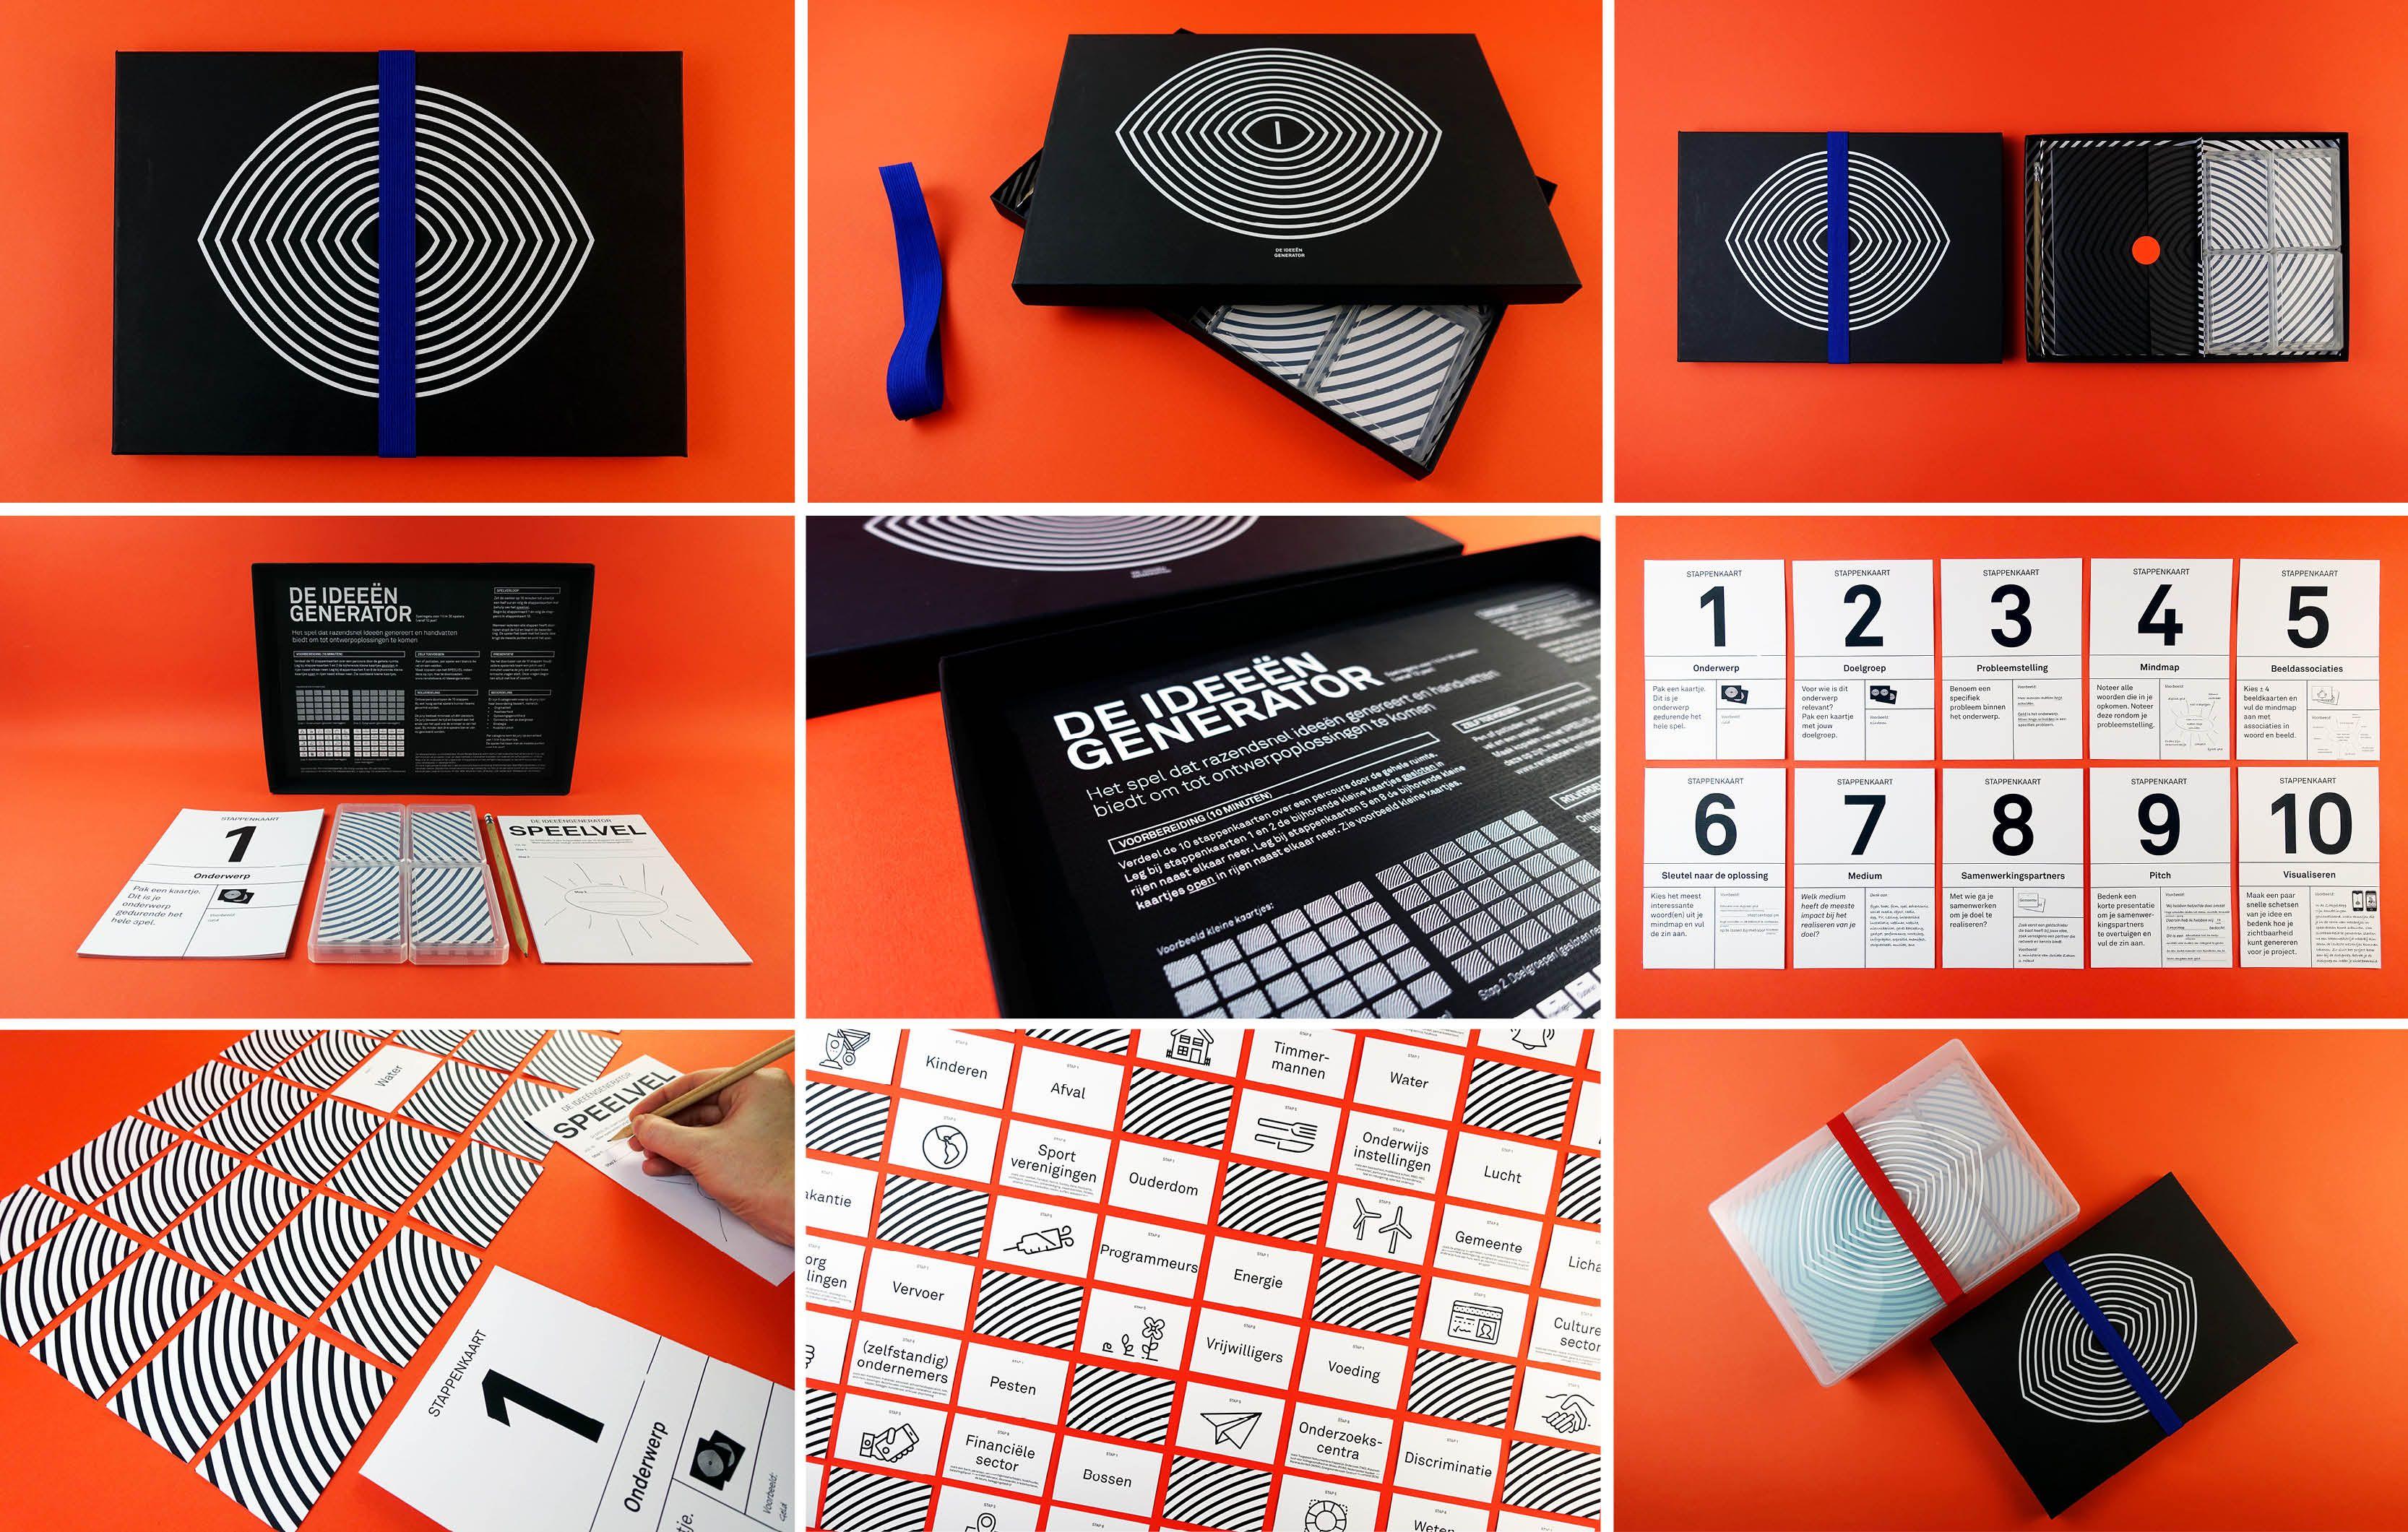 Game 'De Ideeëngenerator' / 'The Idea Generator' by